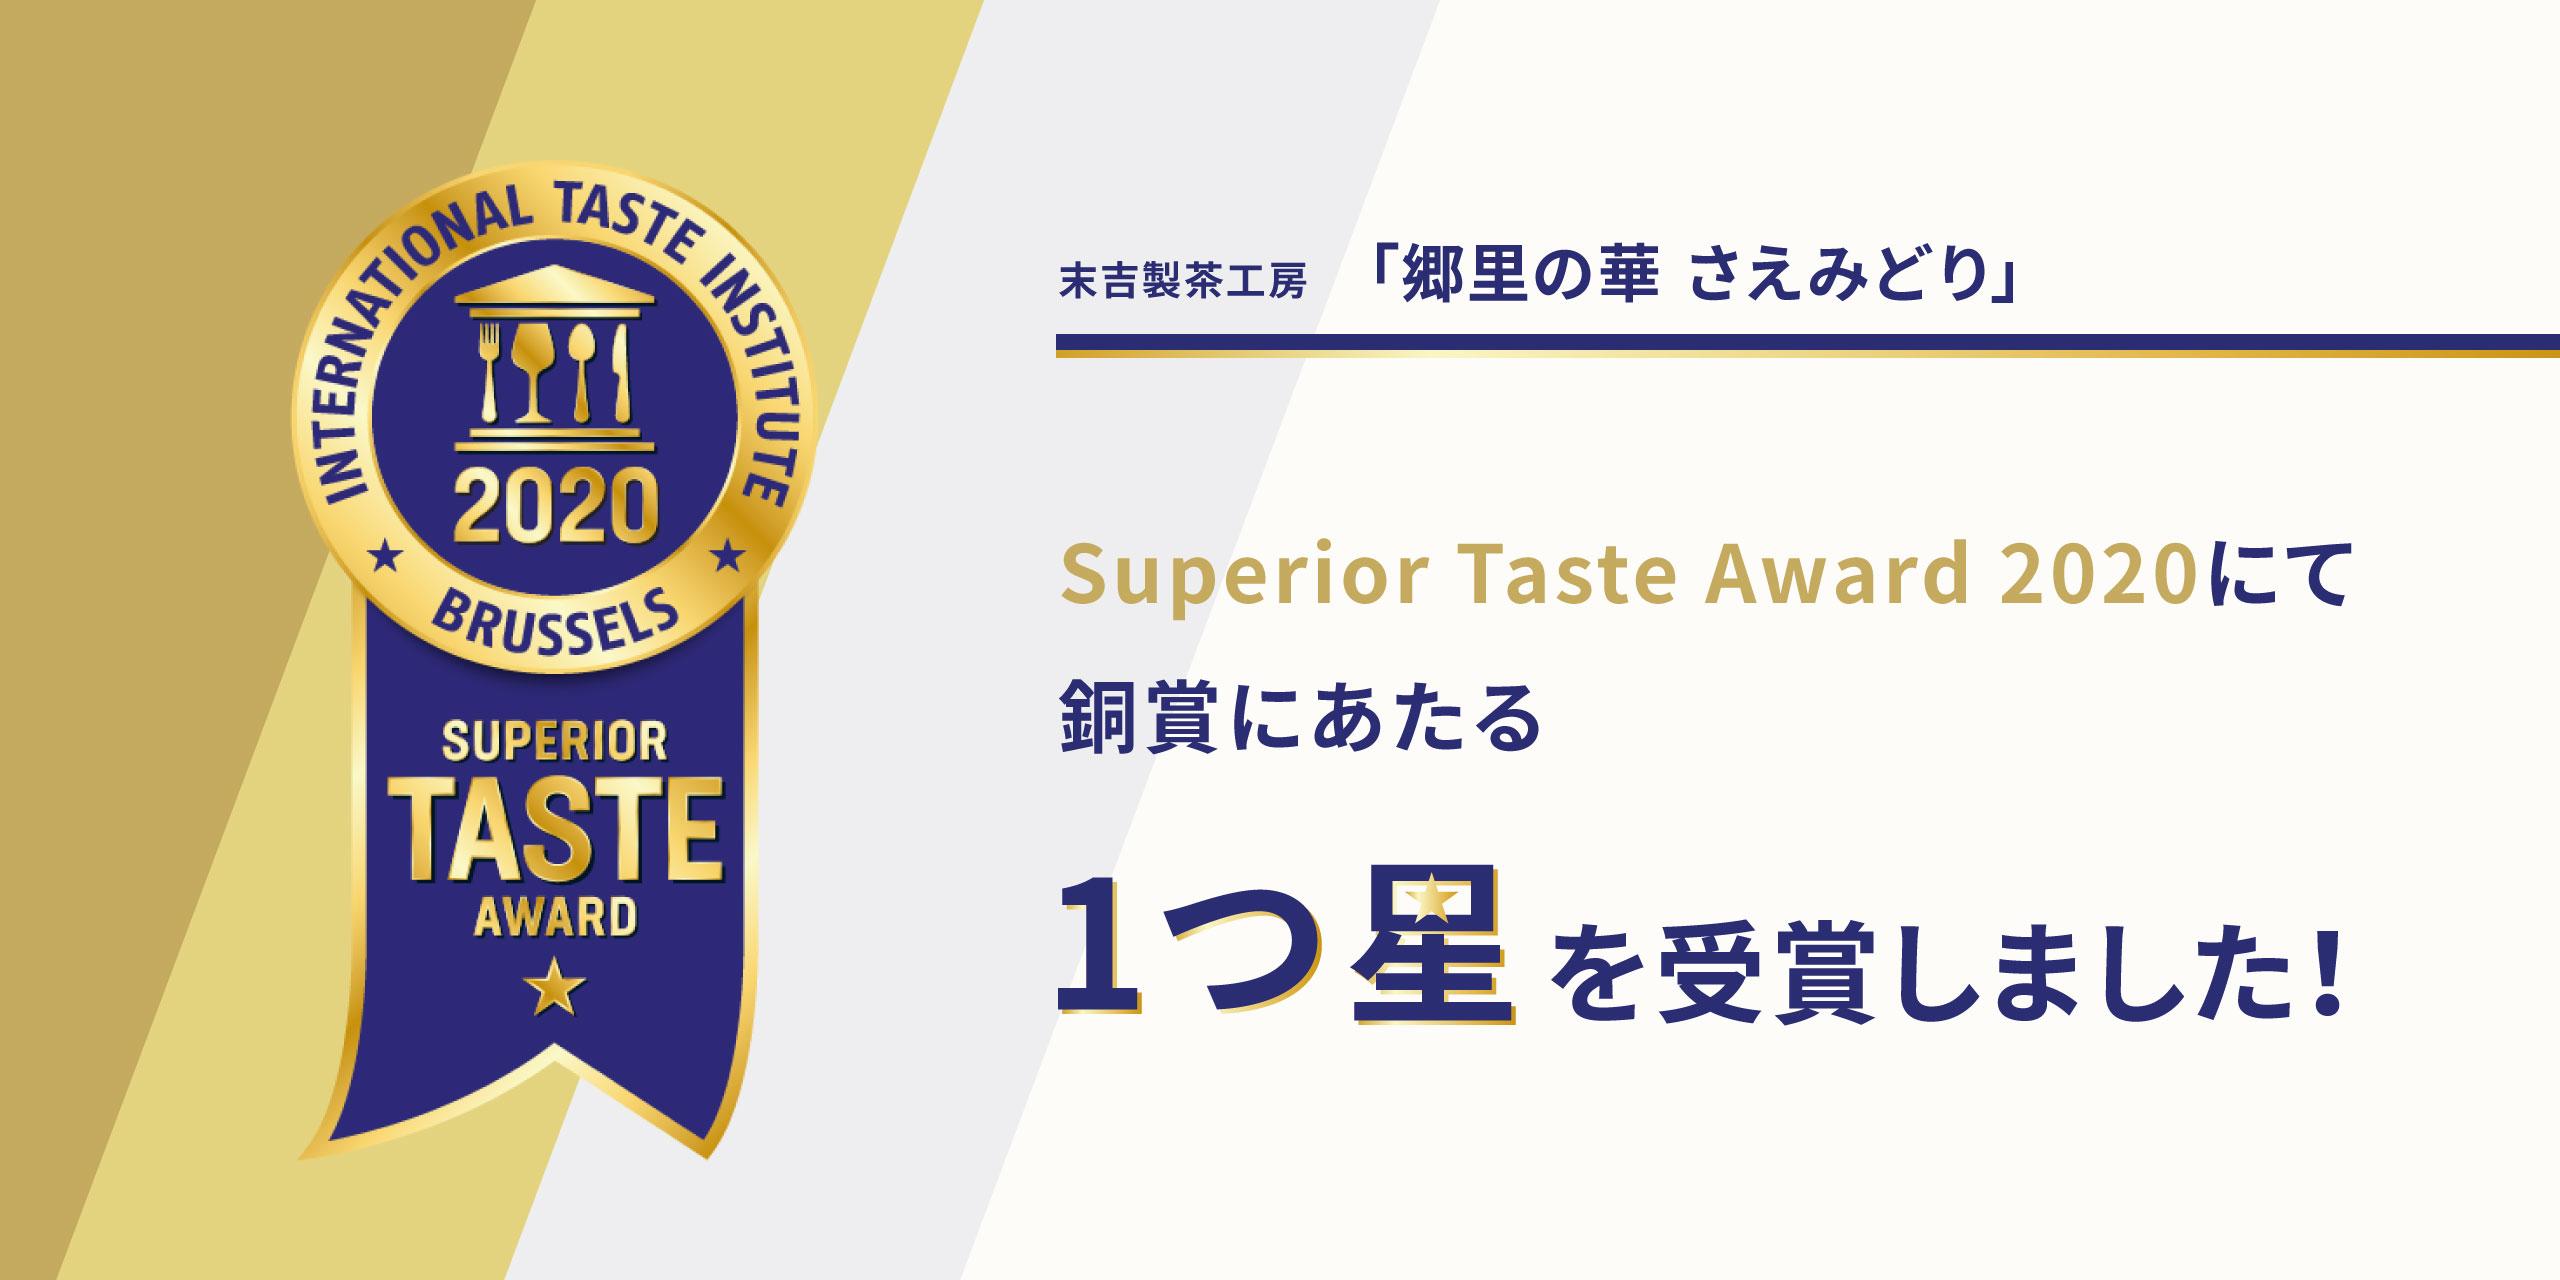 Superior Taste Award 2020にて銅賞にあたる1つ星を受賞しました!